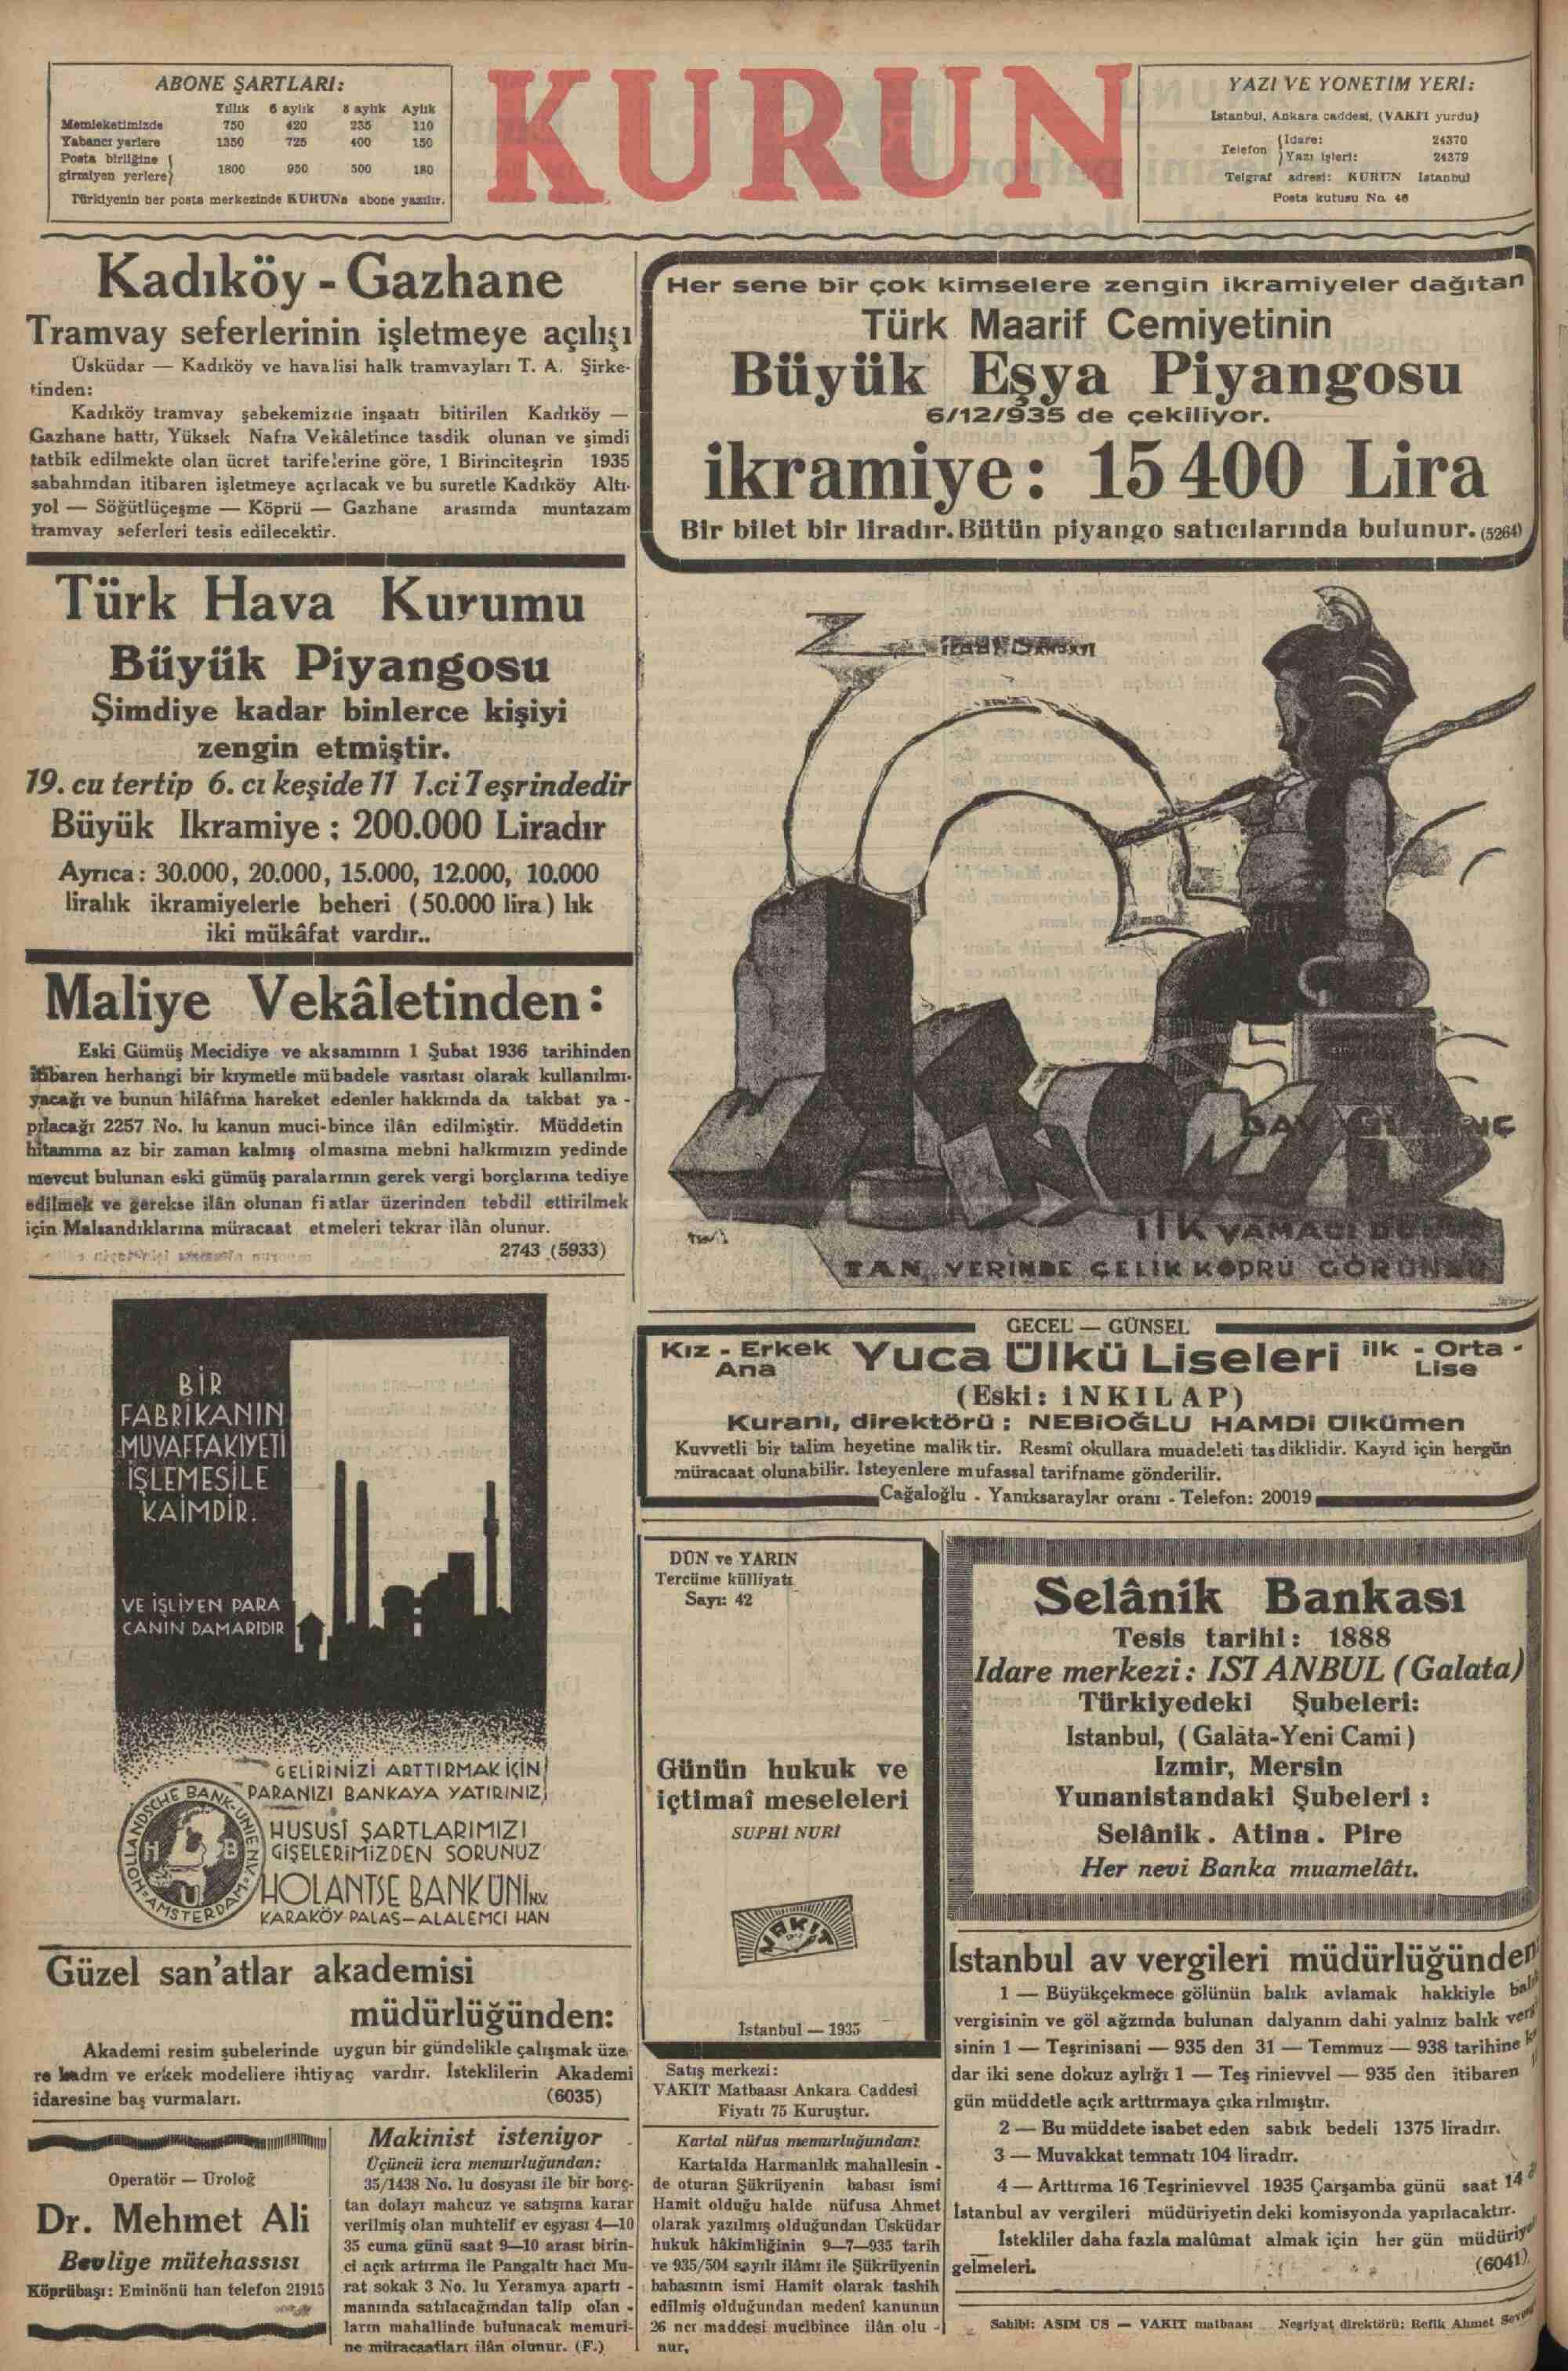 October 1, 1935 Tarihli Kurun Dergisi Sayfa 12